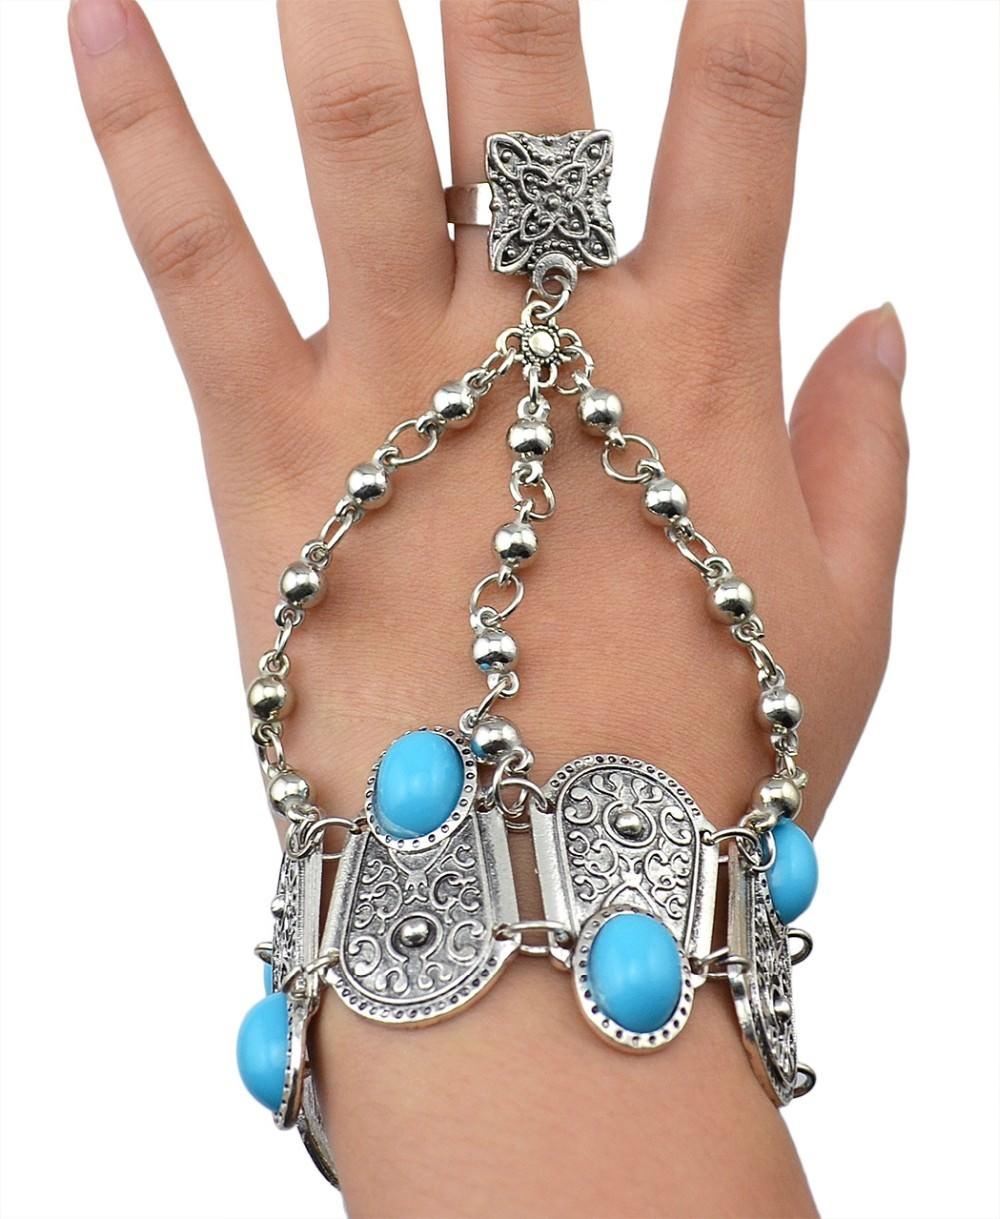 8846-5feaafd8f5cfbf97c7ef8547272b6376 Bohemian Blue Gemmed Chuny Bracelet Jewelry With Floral Designs